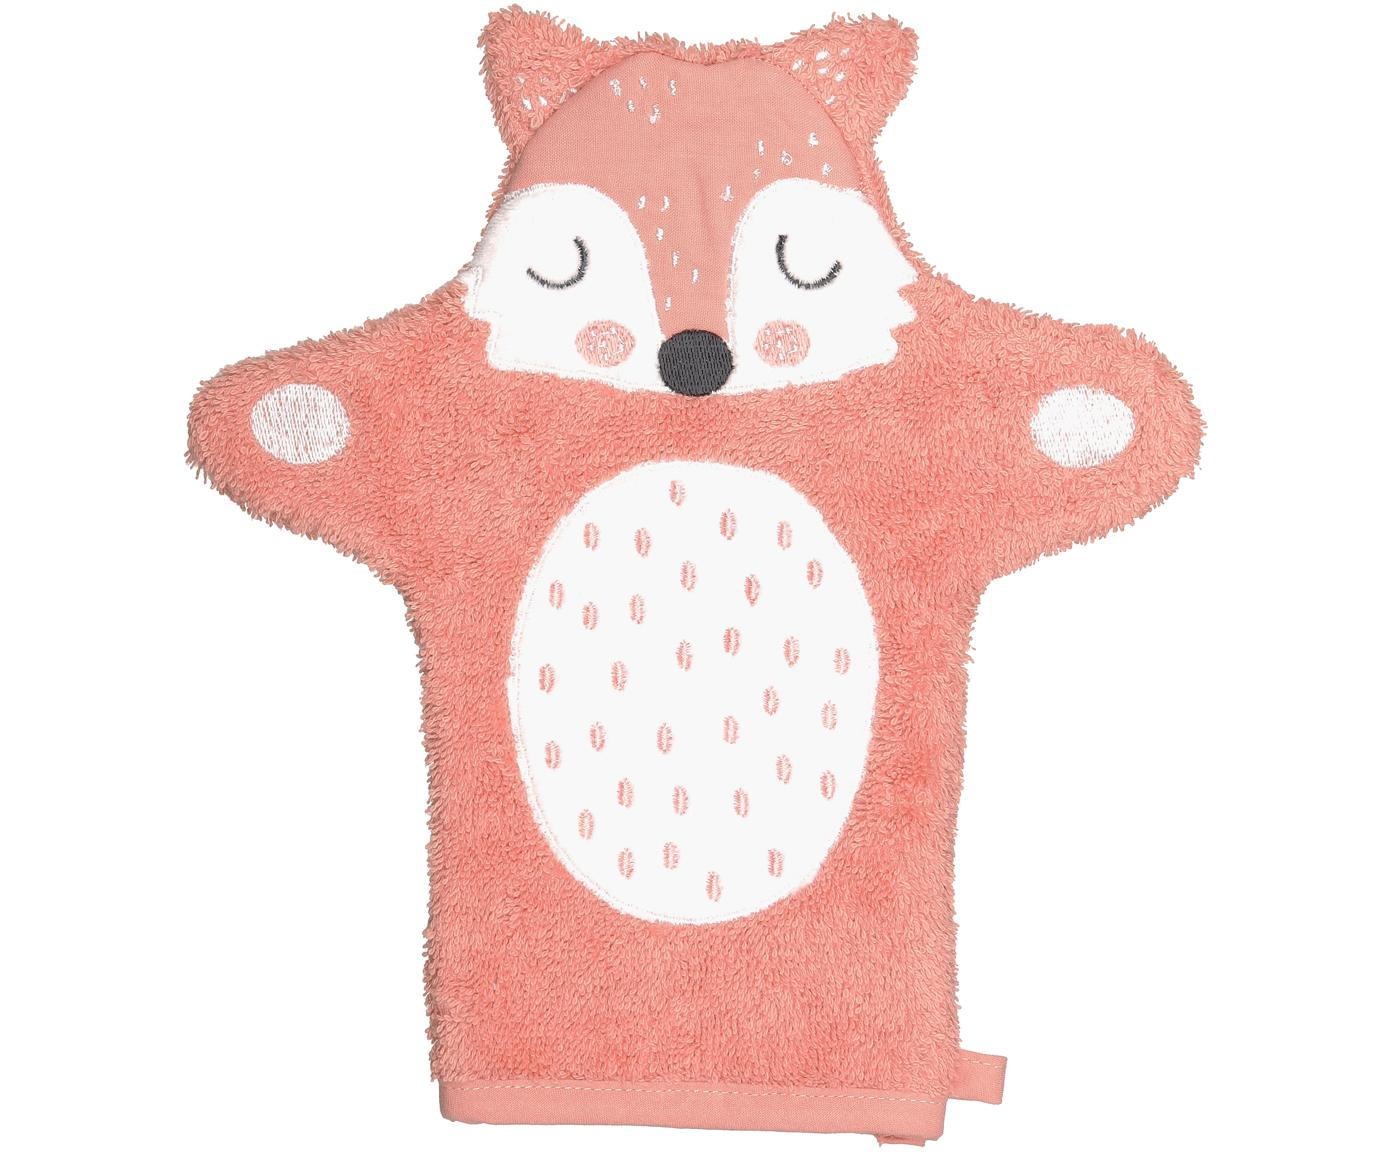 Manopla de baño de algodón ecológico Fox Frida, Algodón orgánico, certificado GOTS, Rosa, blanco, negro, An 21 x L 25 cm